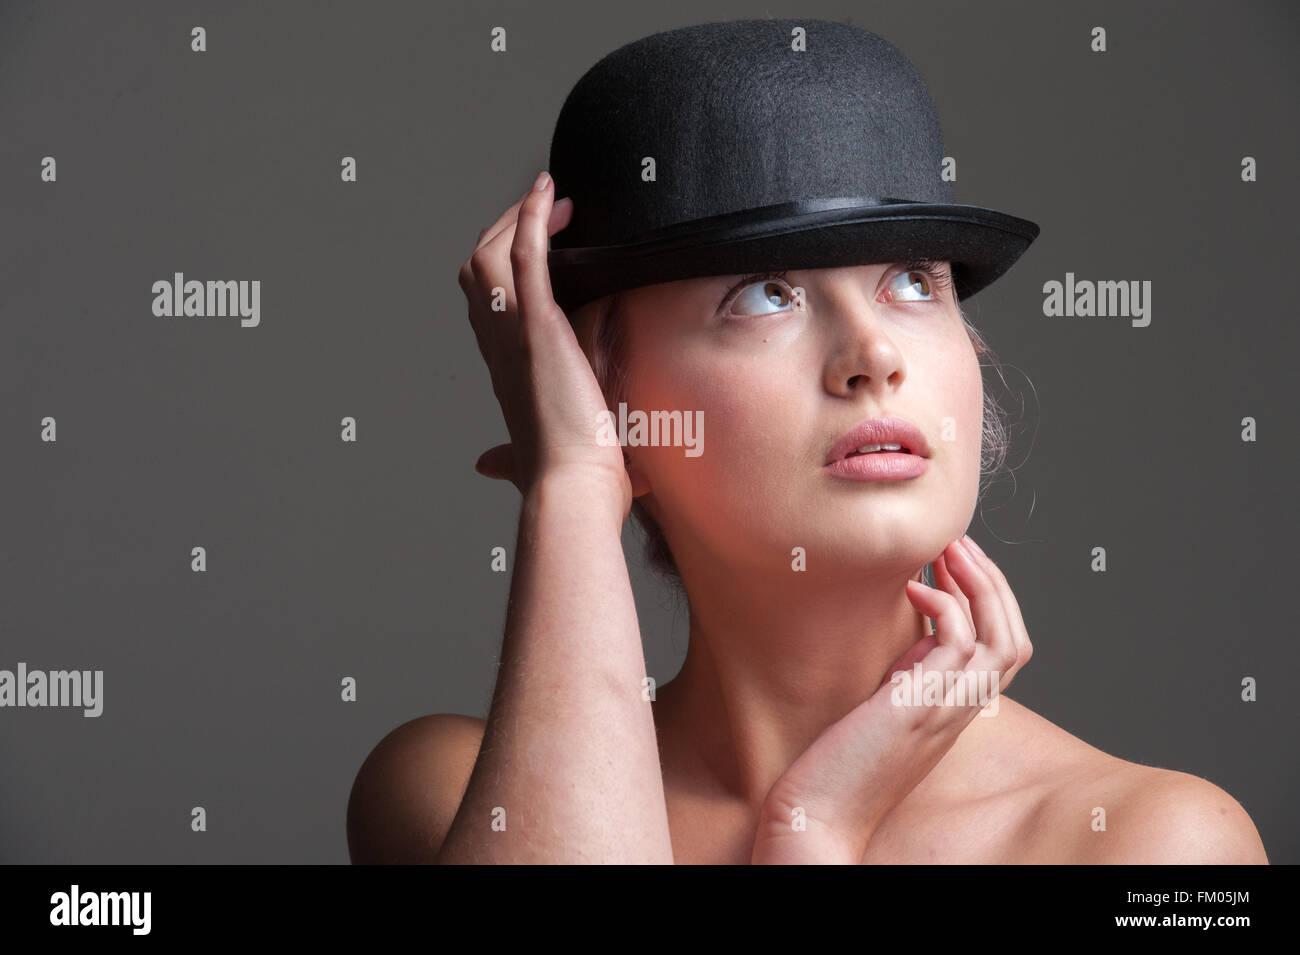 Hat Woman Imágenes Bowler Stock Girl Woman Girl Bowler amp; Hat De ZwExT8q